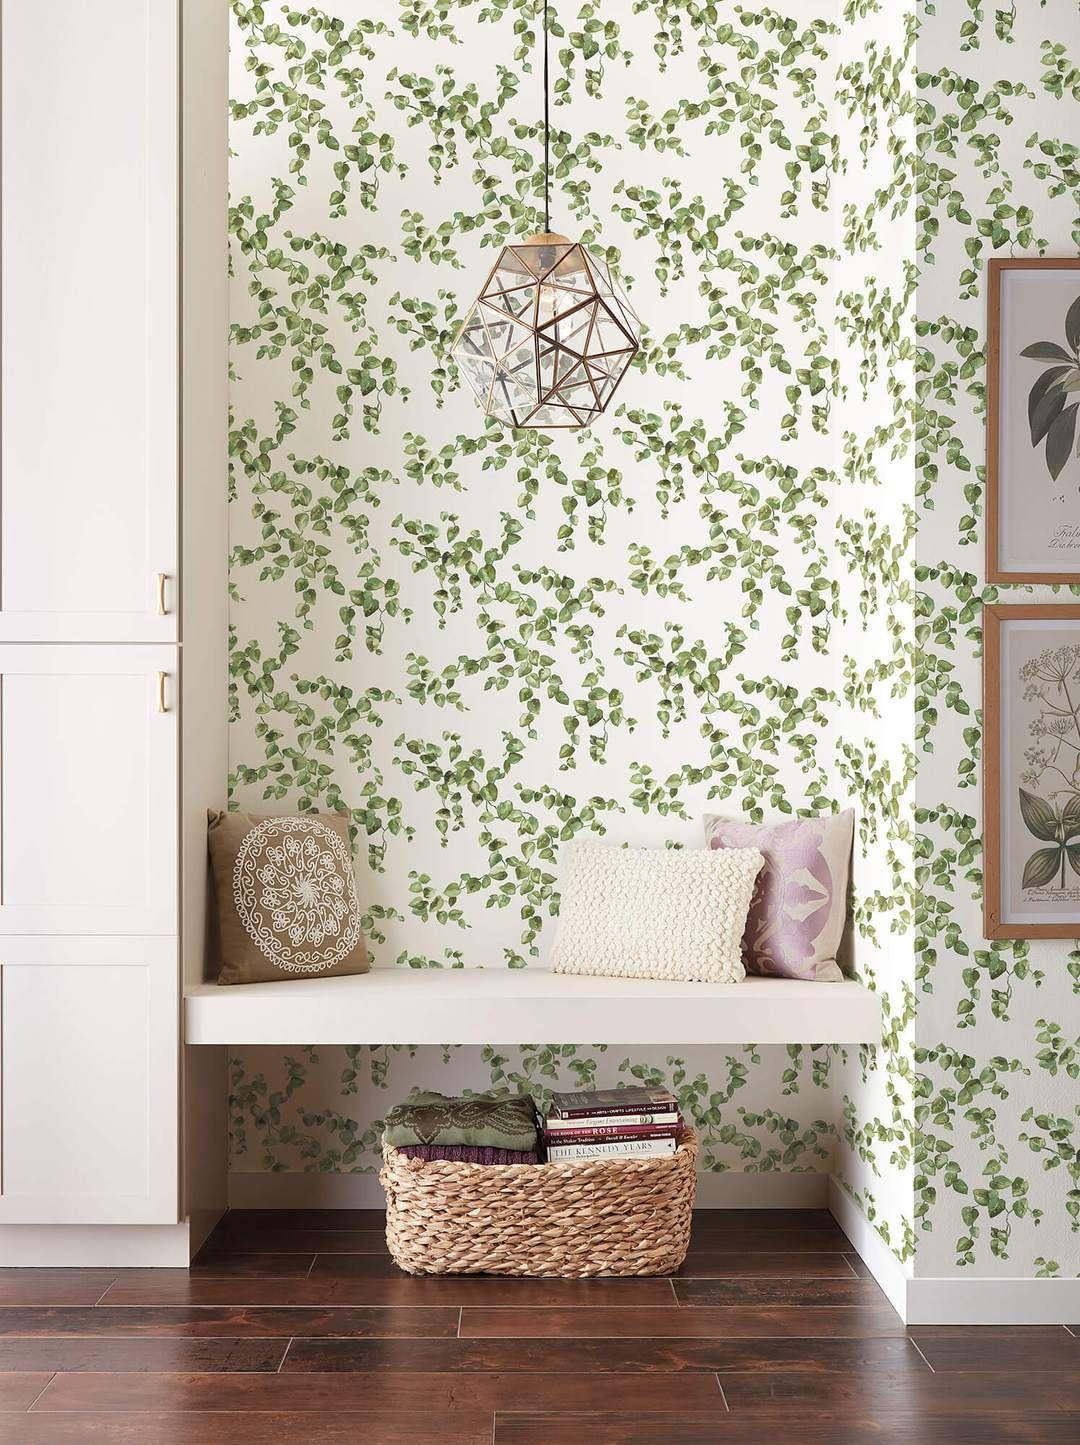 Simply Farmhouse Creeping Fig Vine Wallpaper Green in